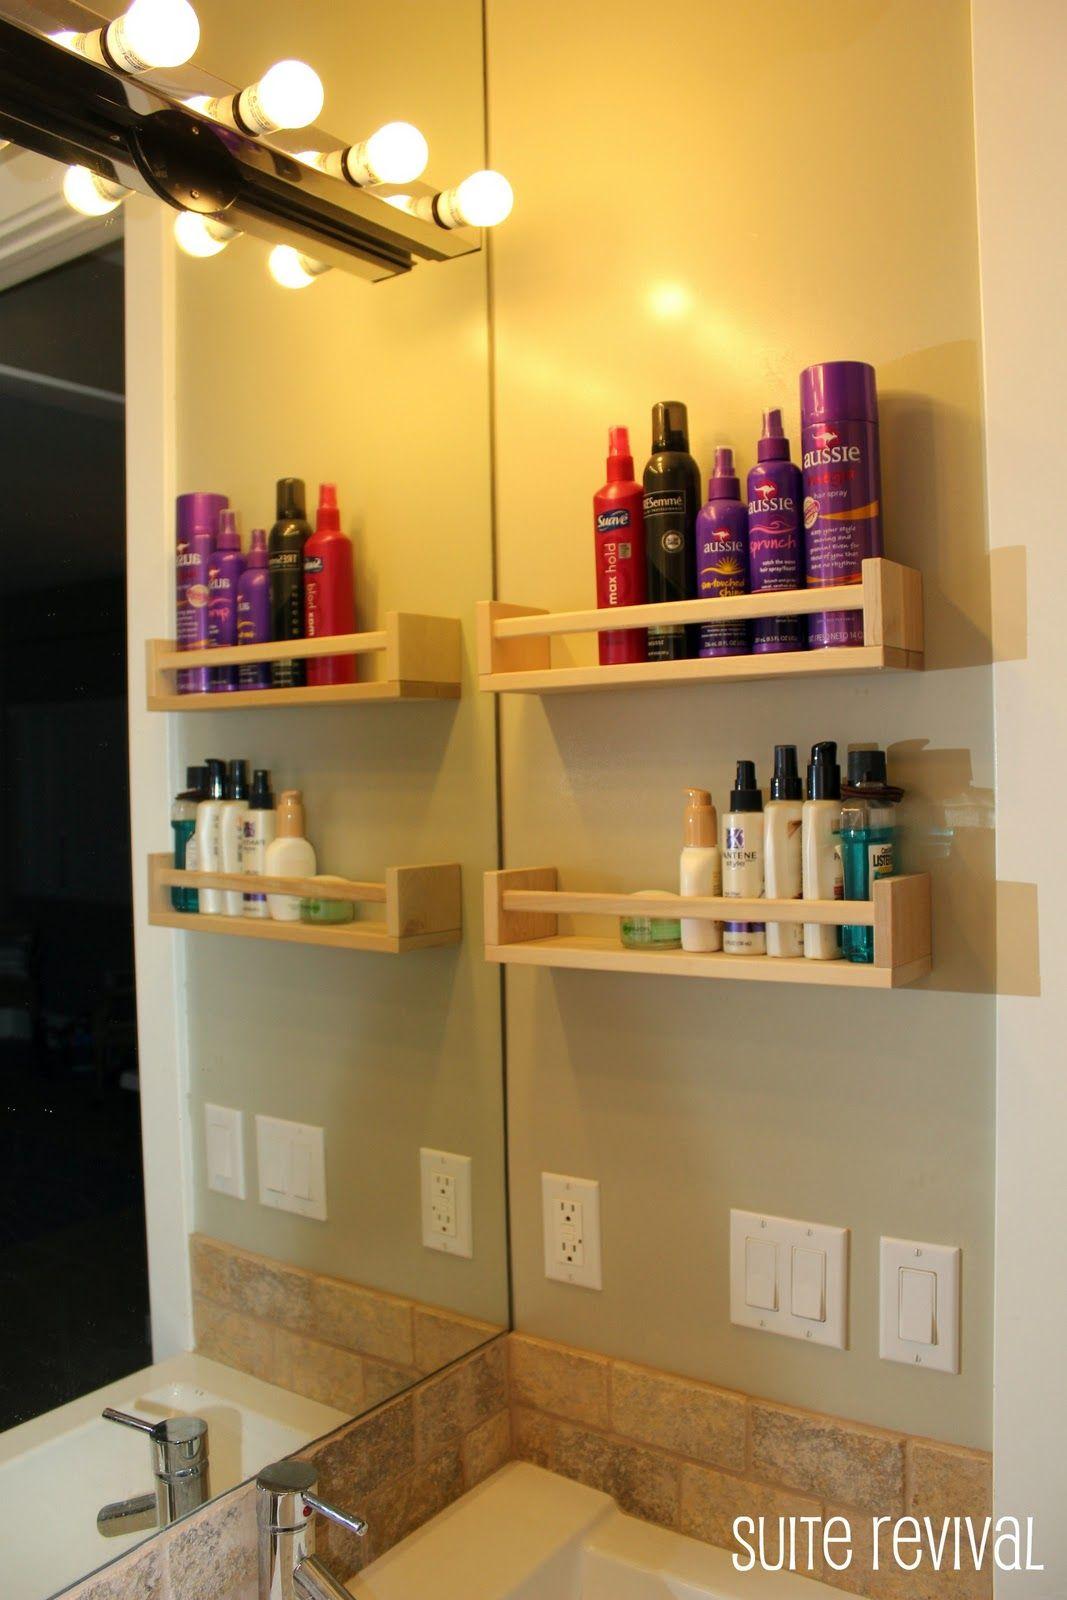 20 Cheap DIY Storage Ideas To Organize Your Bathroom | Spice racks ...